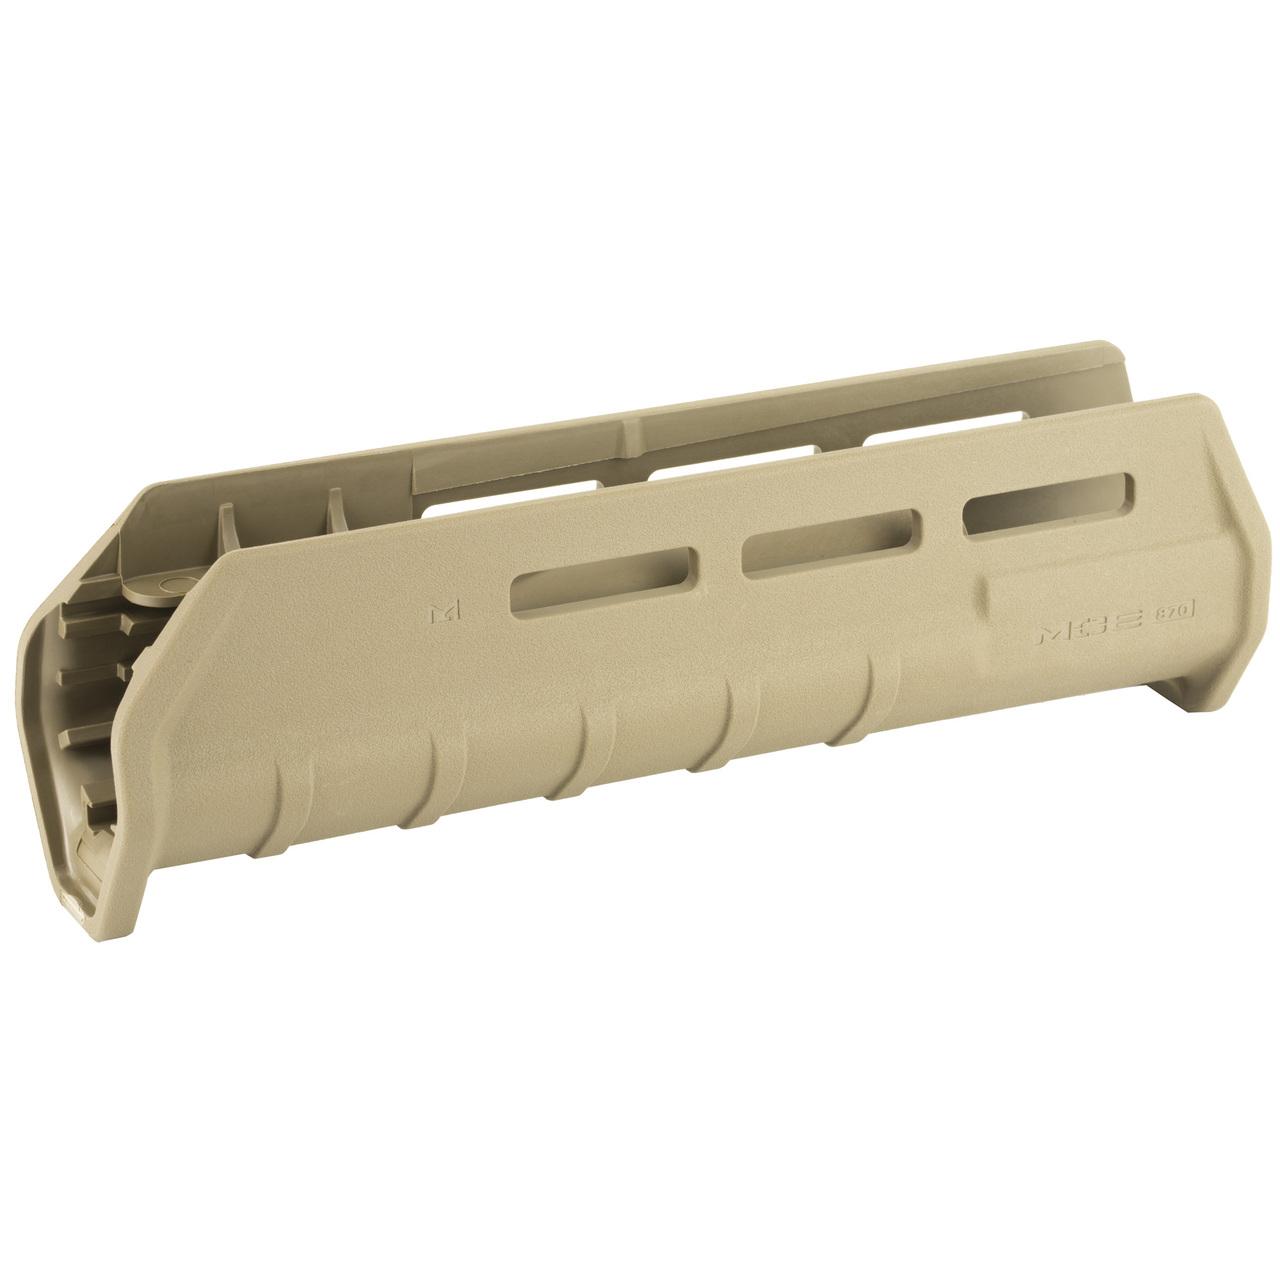 Magpul MOE M-LOK Forend Remington 870 FDE